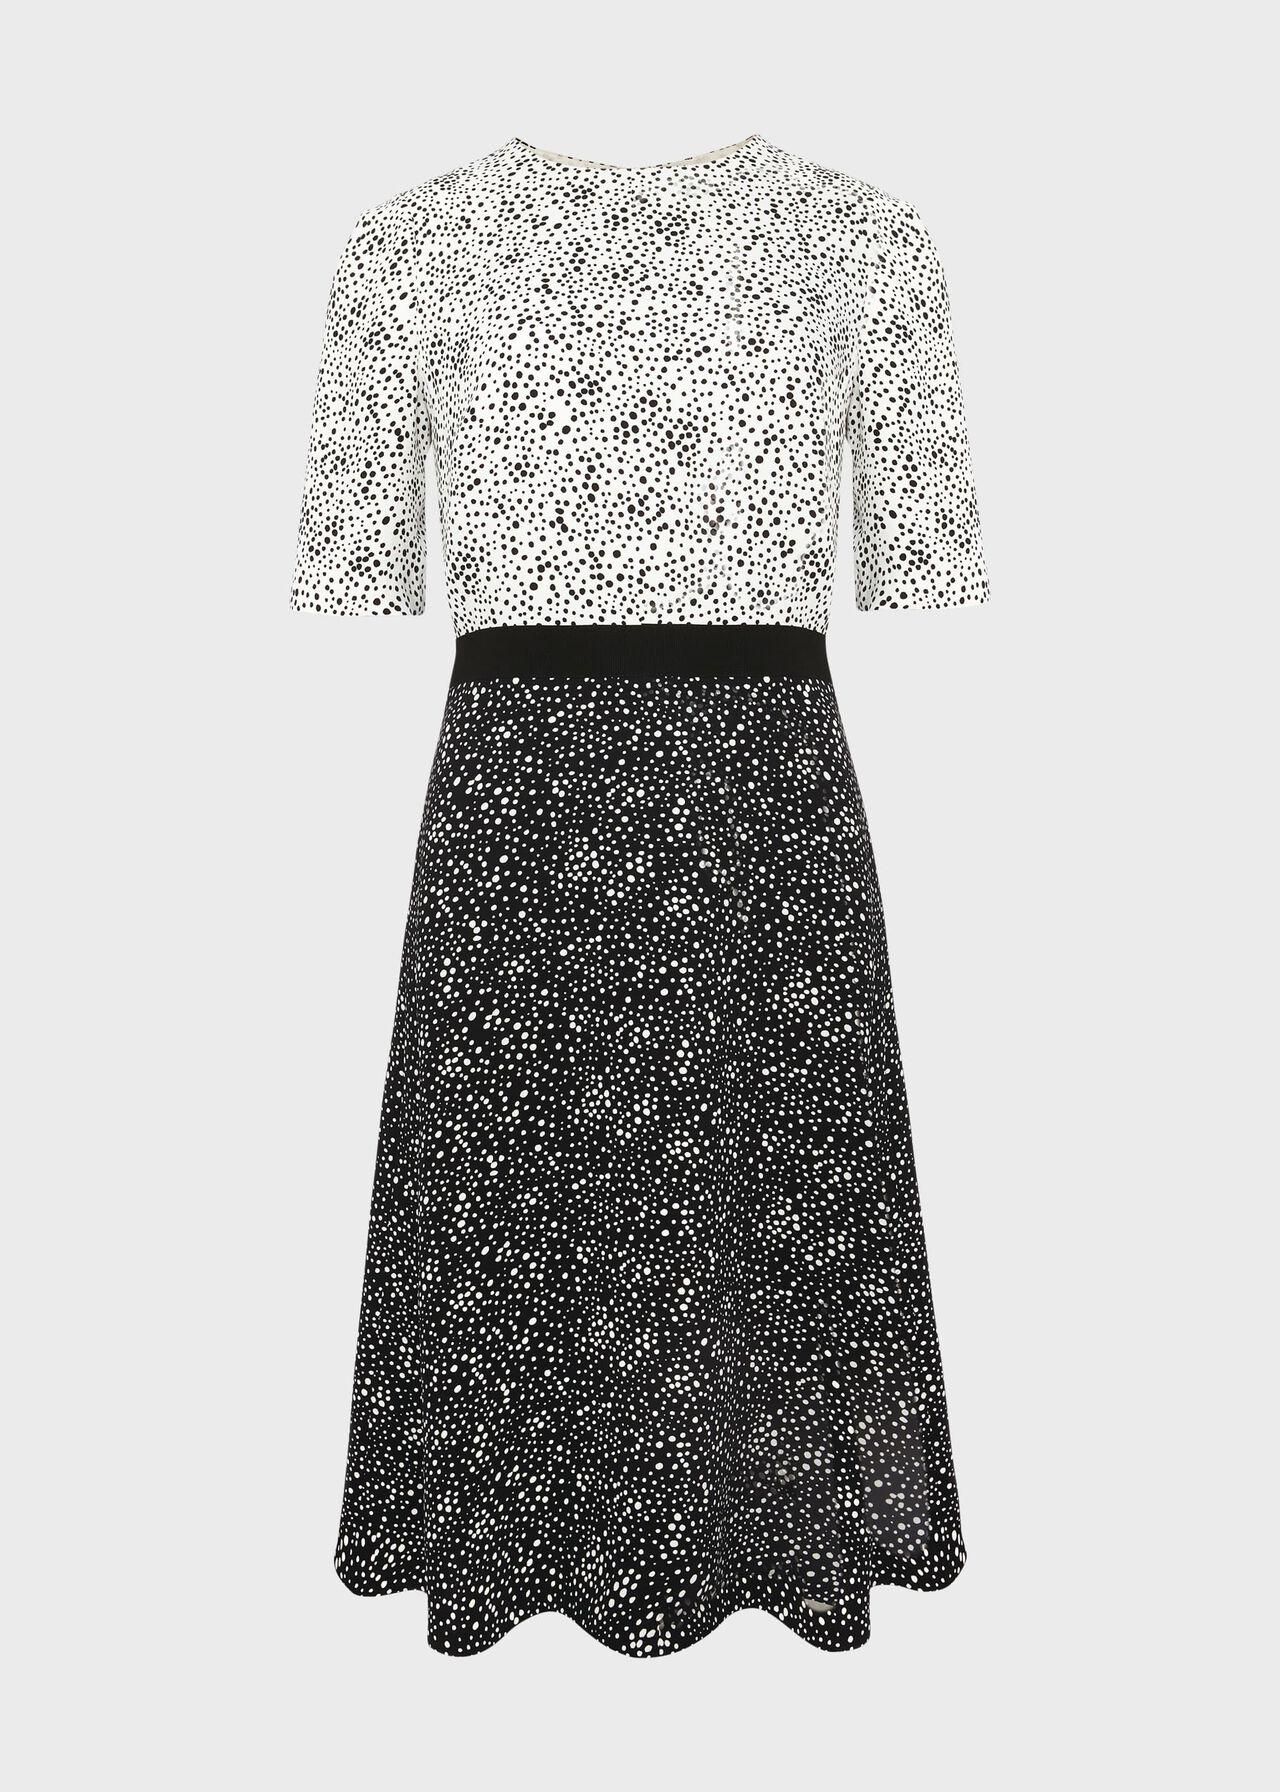 Caroline Crepe Dress Ivory Black